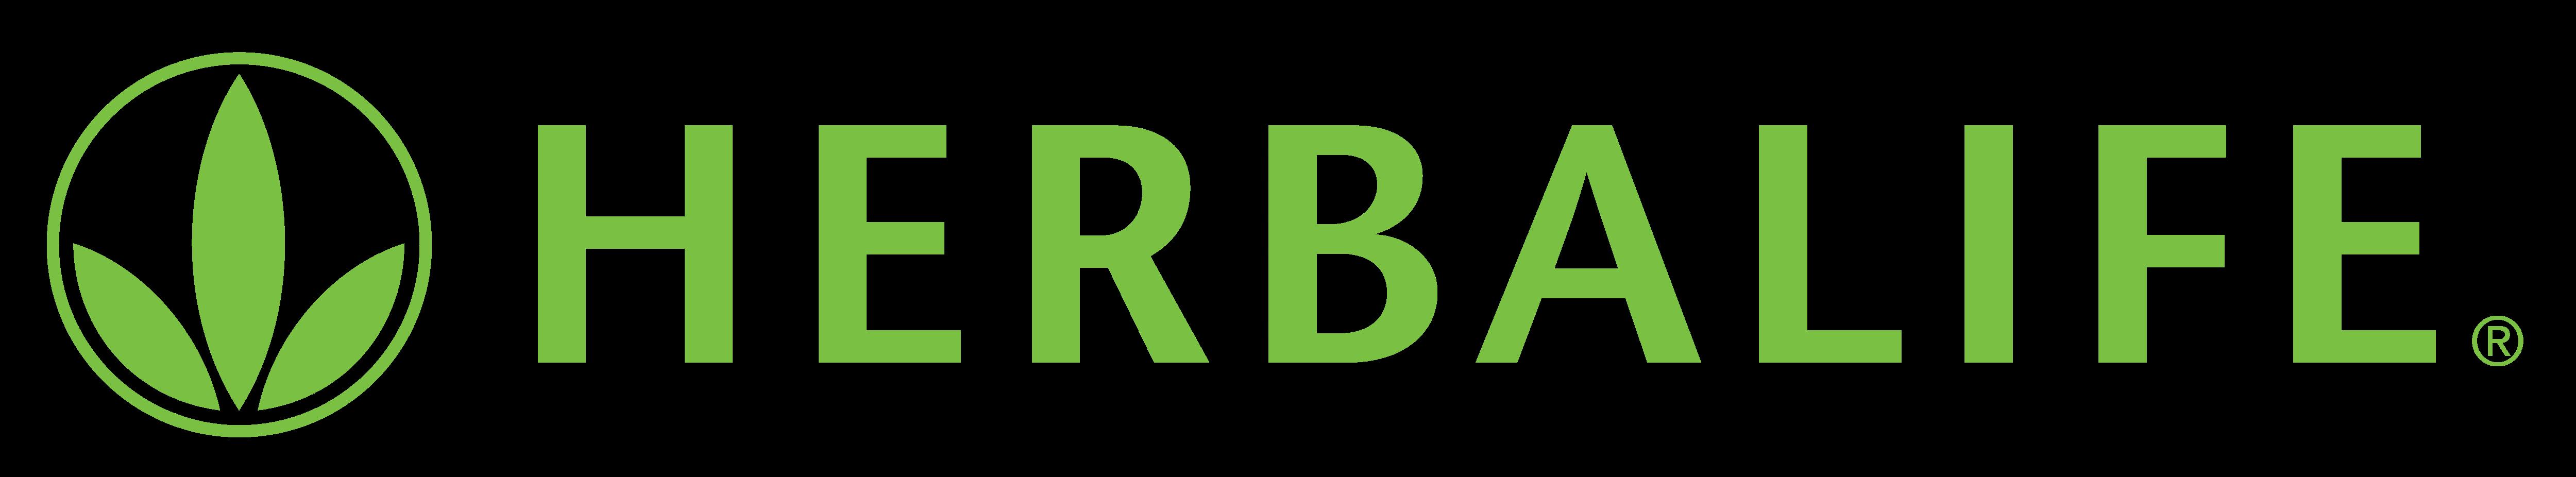 Herbalife – Logos Download - Herbalife 24 Logo